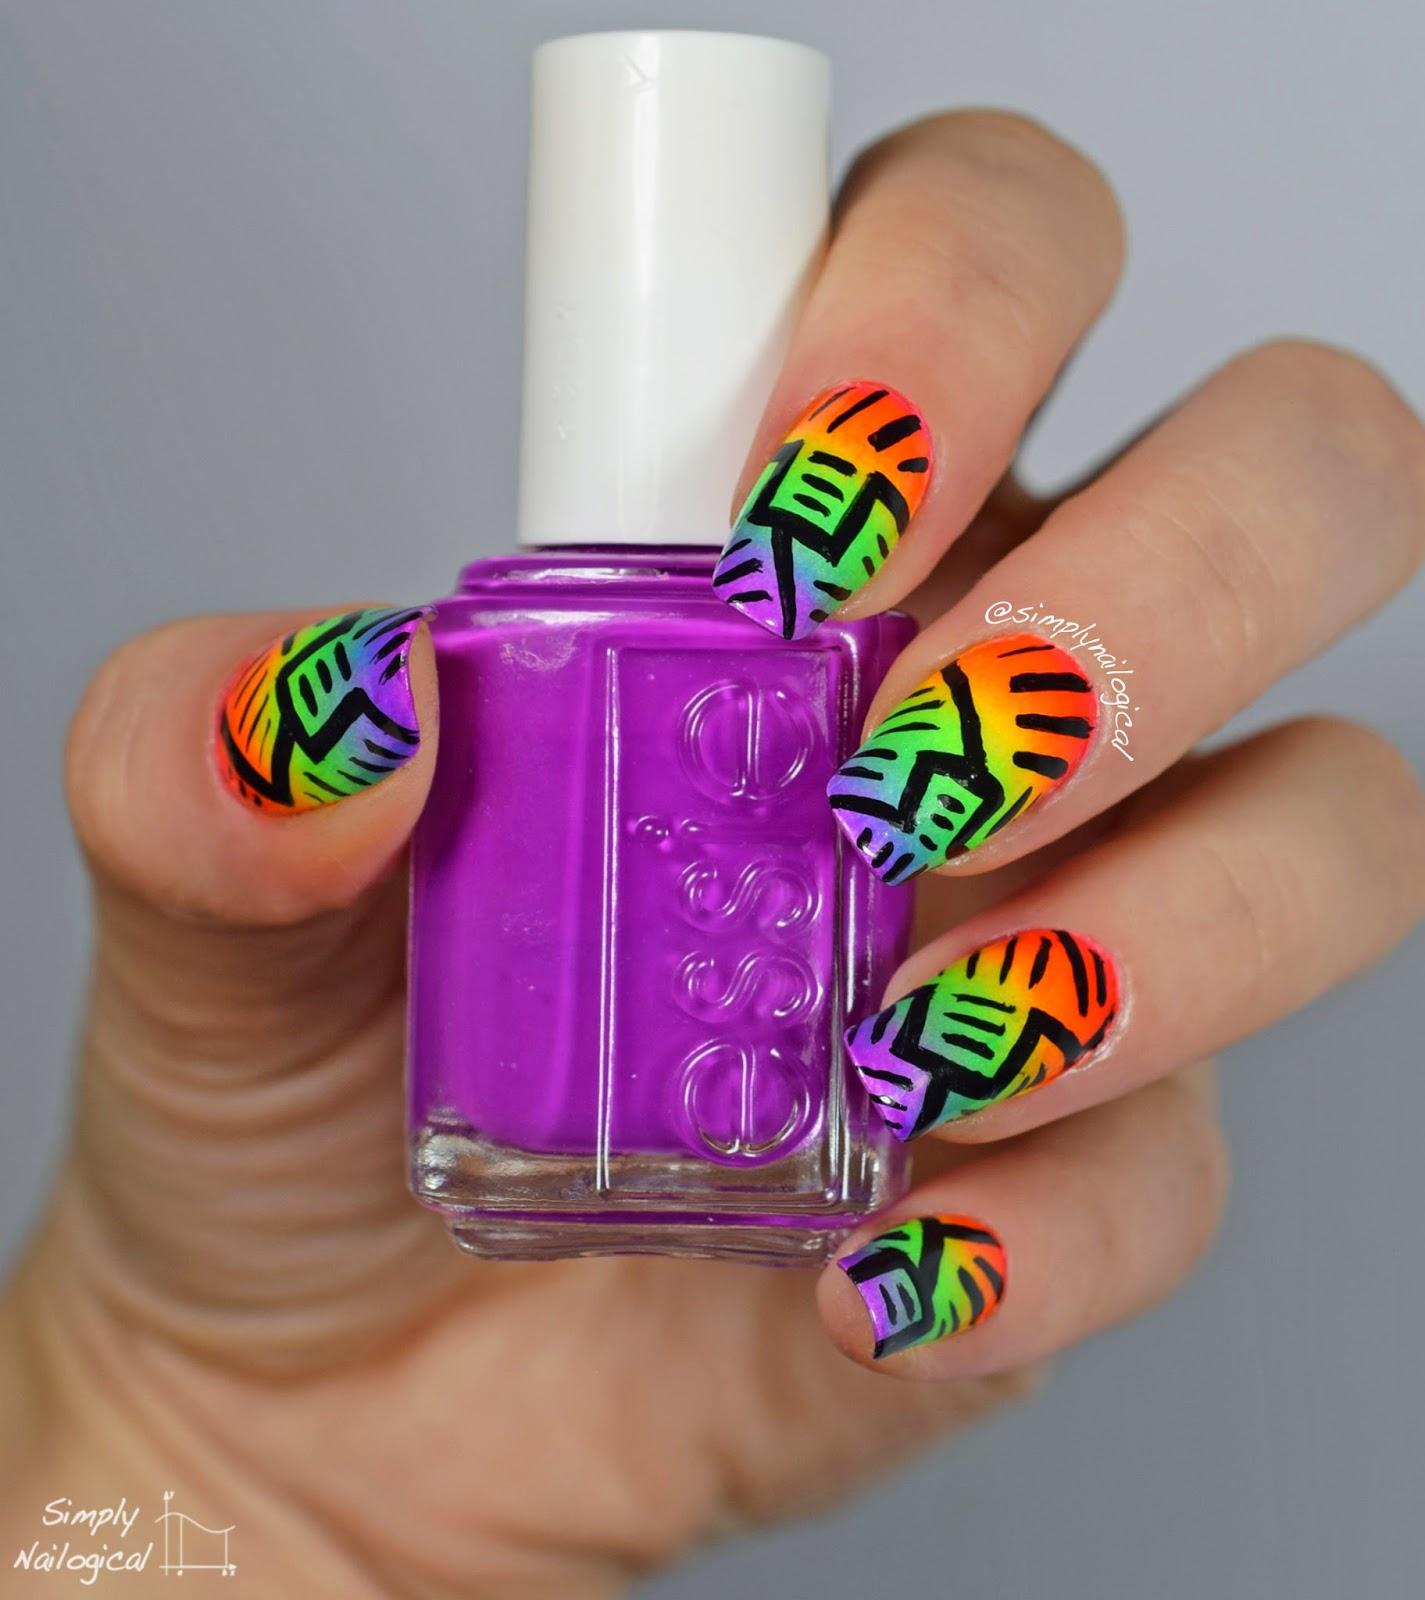 Simply Nailogical: Ermahgerd rainbow gradient recreation